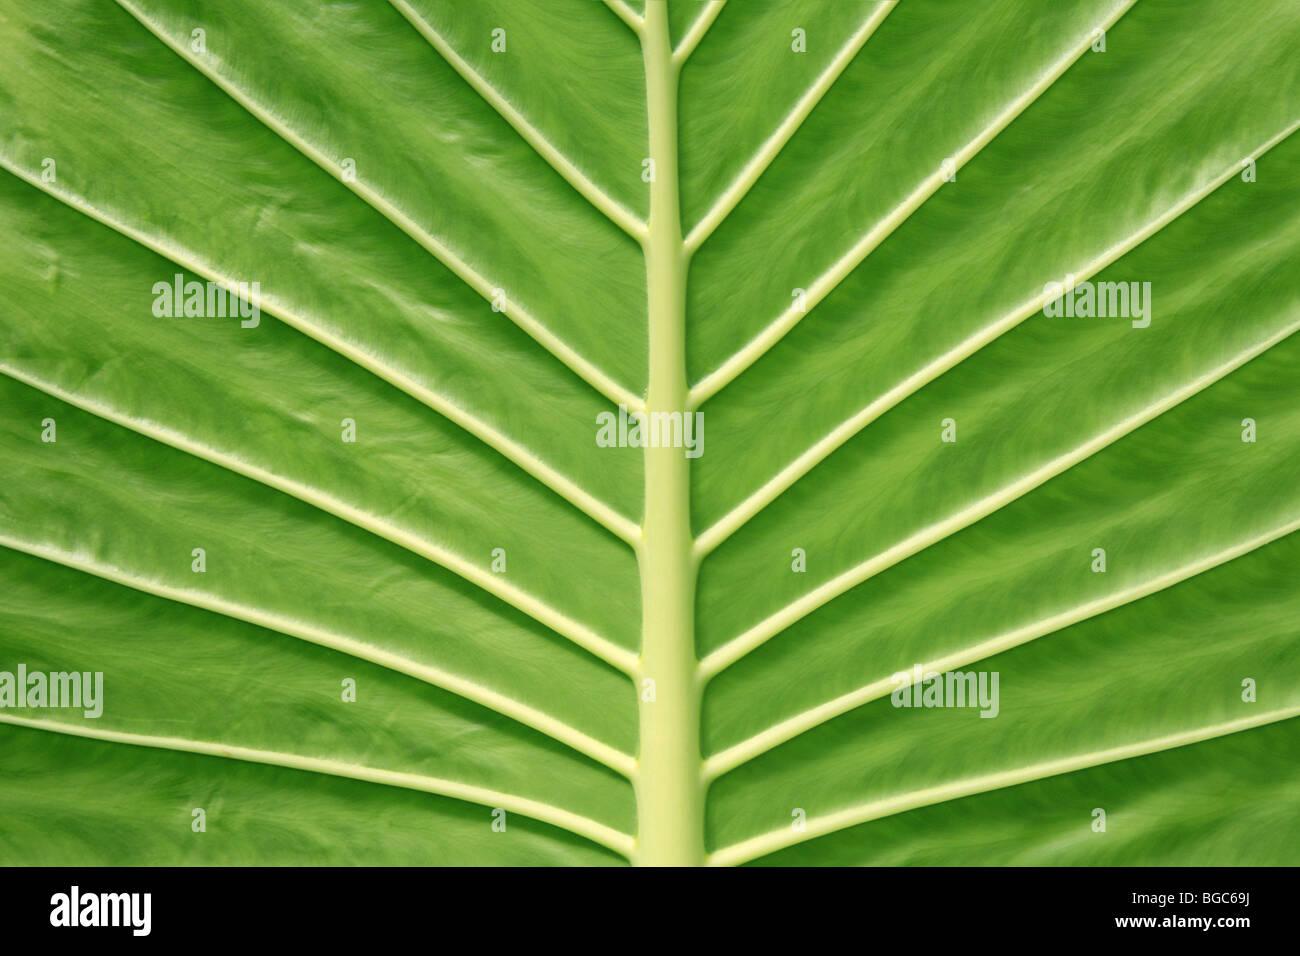 Big Green Leaf Veins Underside Symmetry Symmetrical